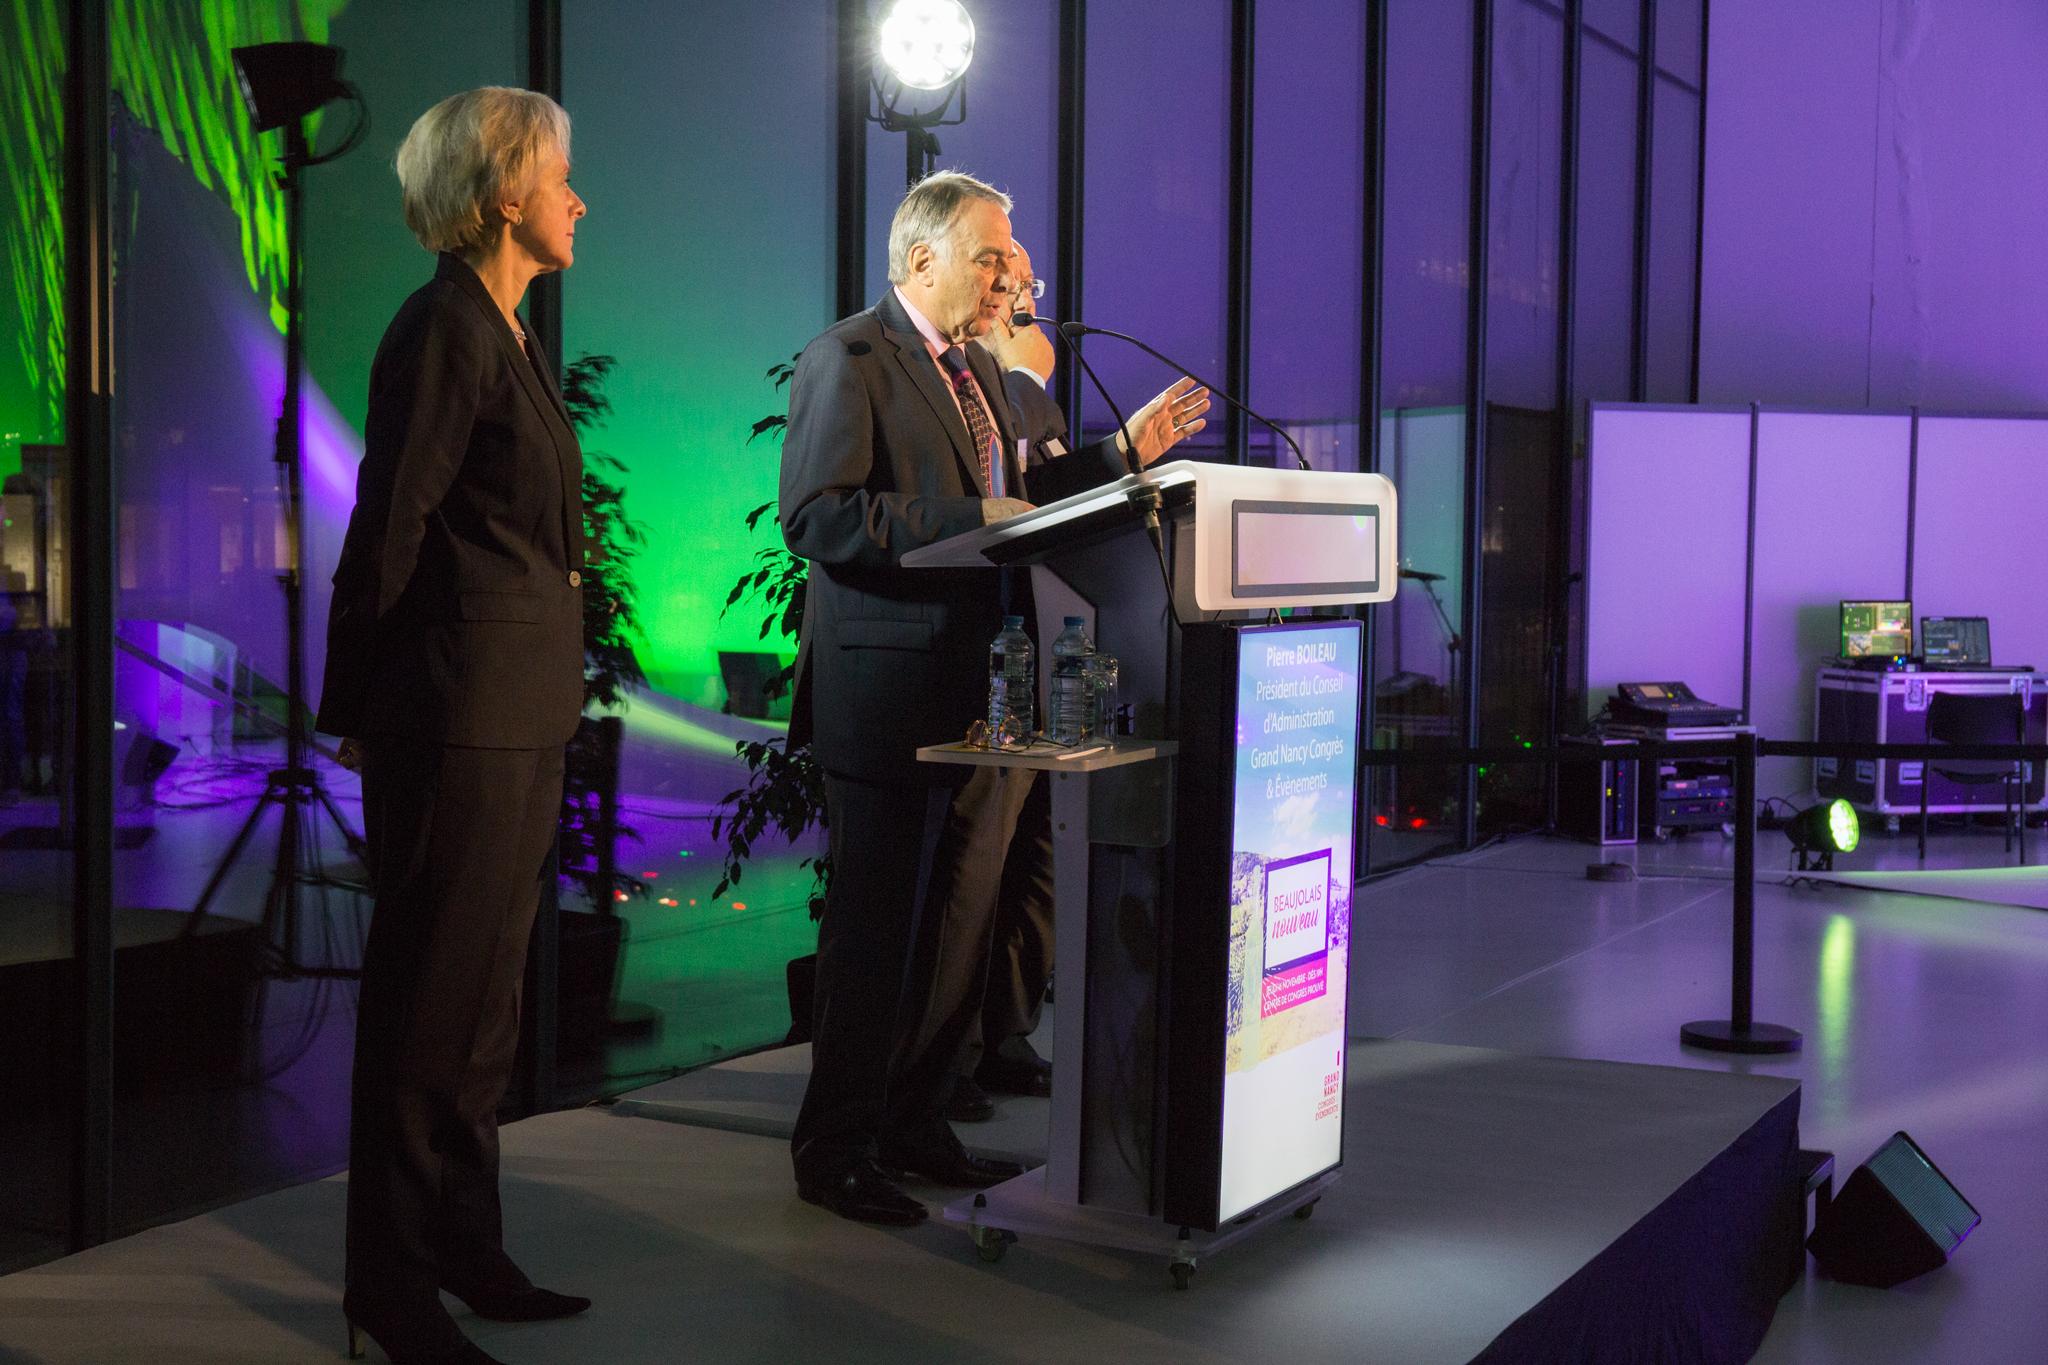 Grand Nancy Congrès & Evènements